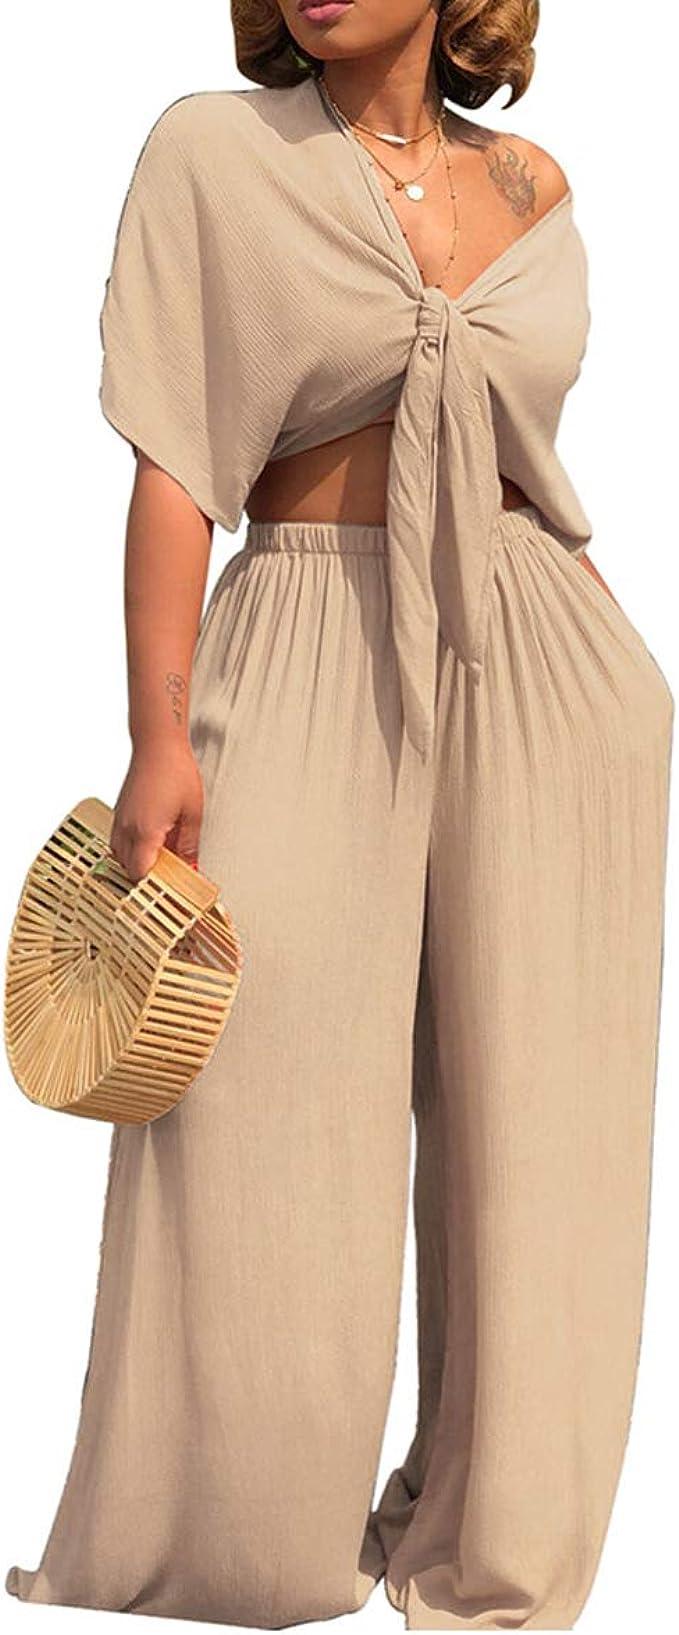 New Fashion Women/'s Draped Sleeveless Solid Color Casual Wide Leg Pants Set Club